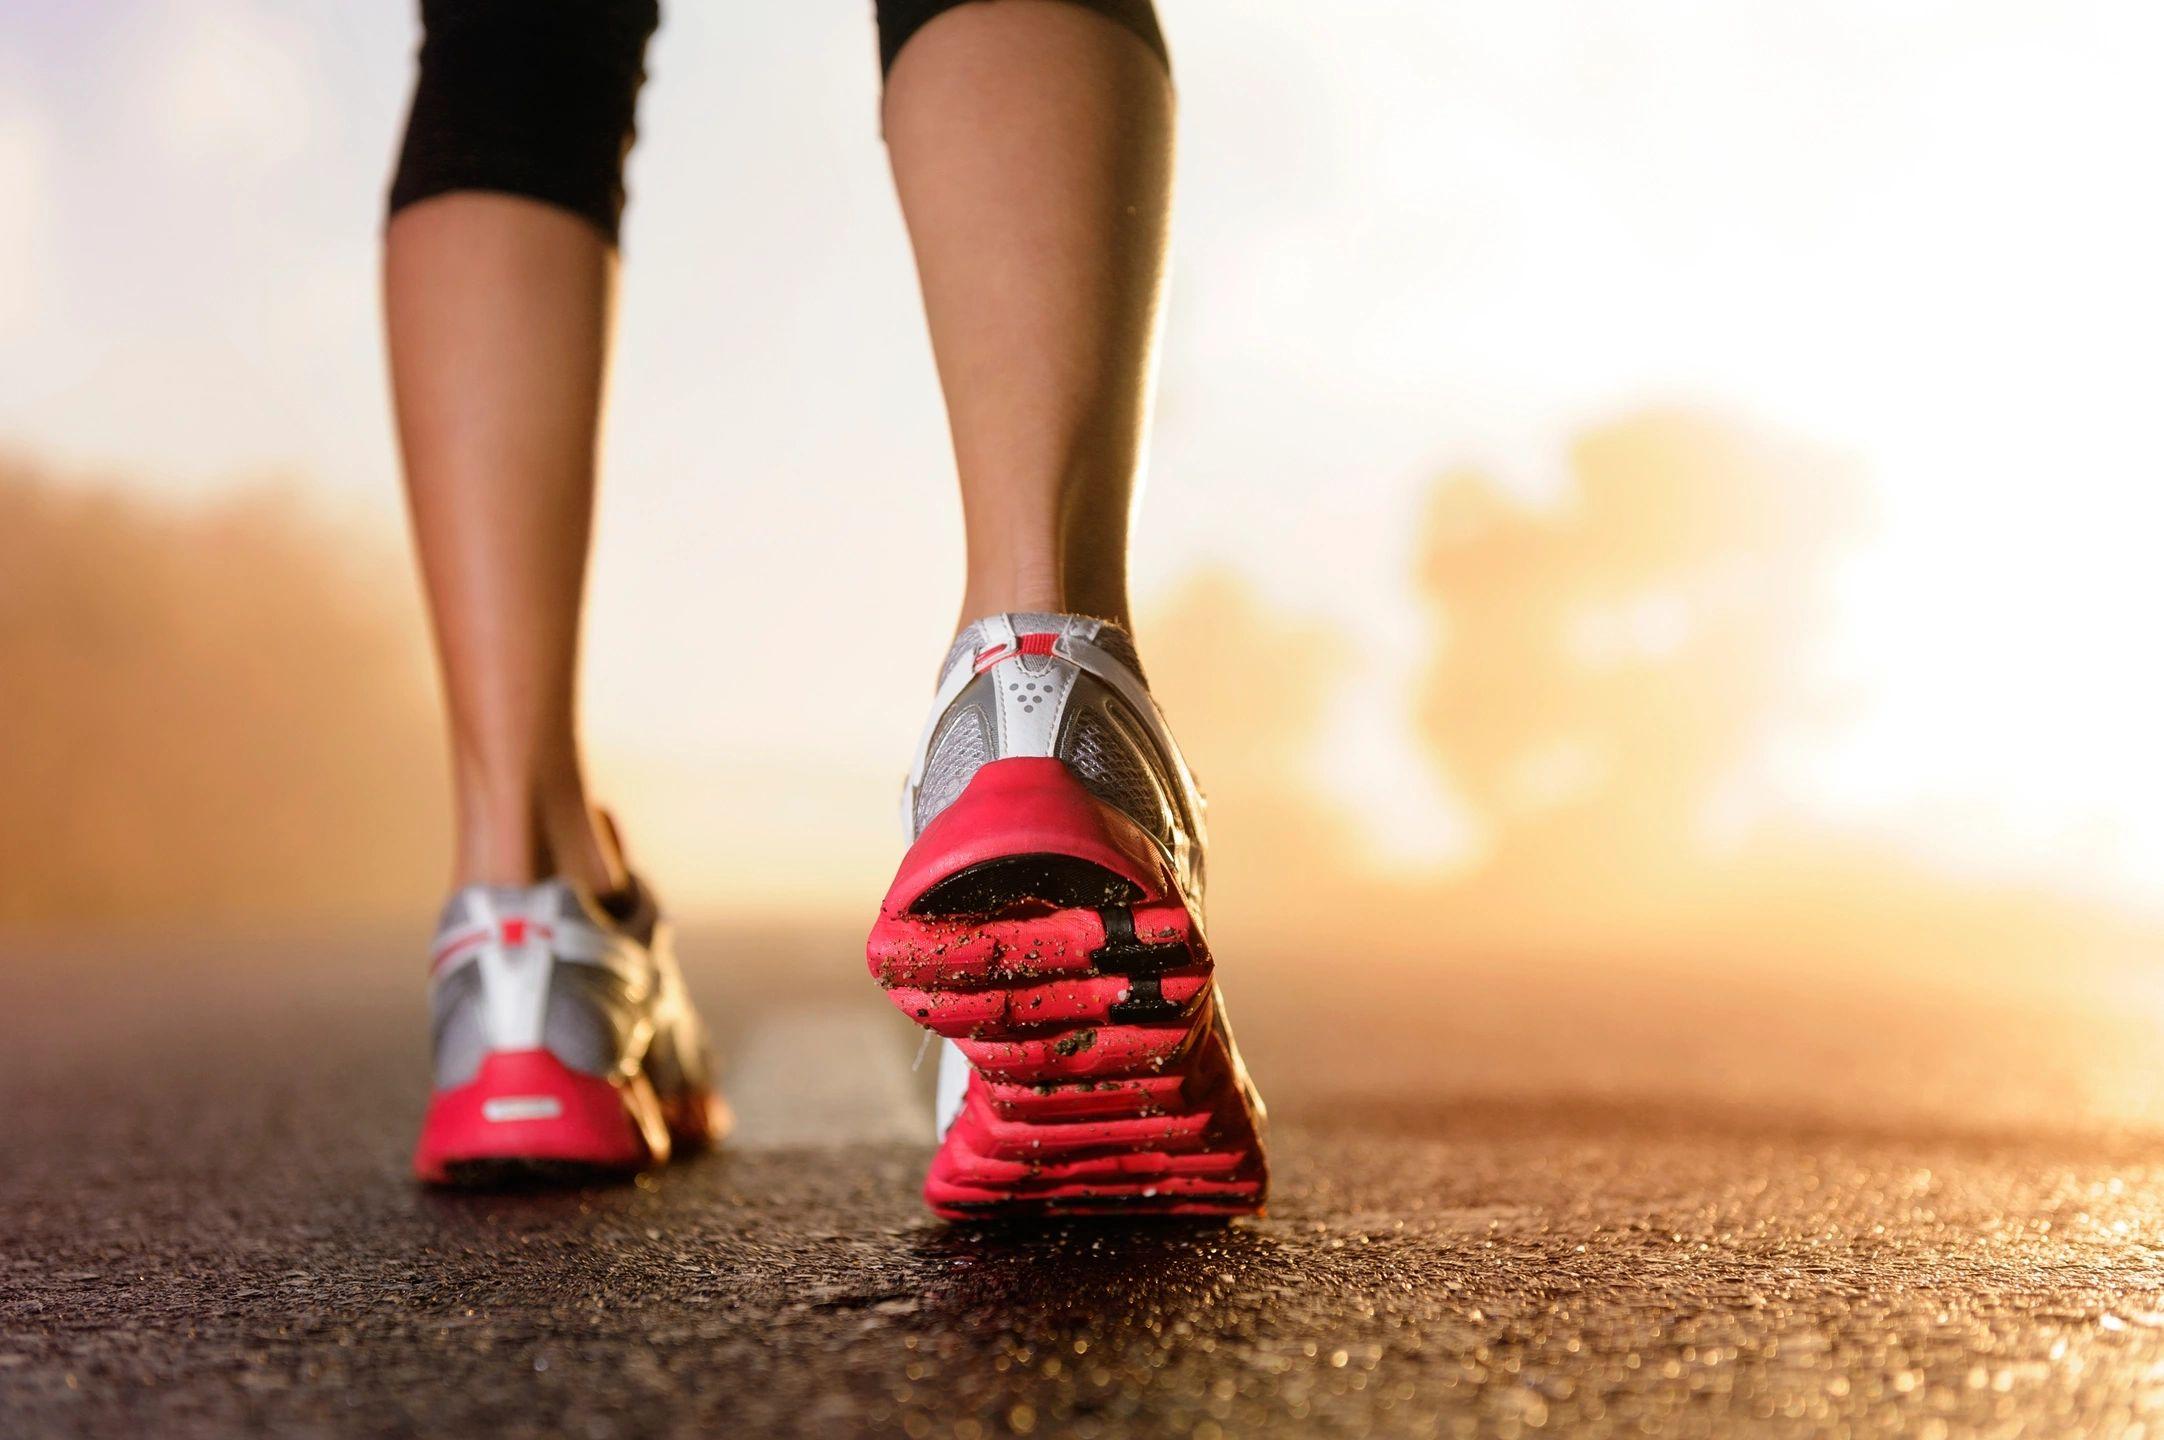 Endurance Athletes